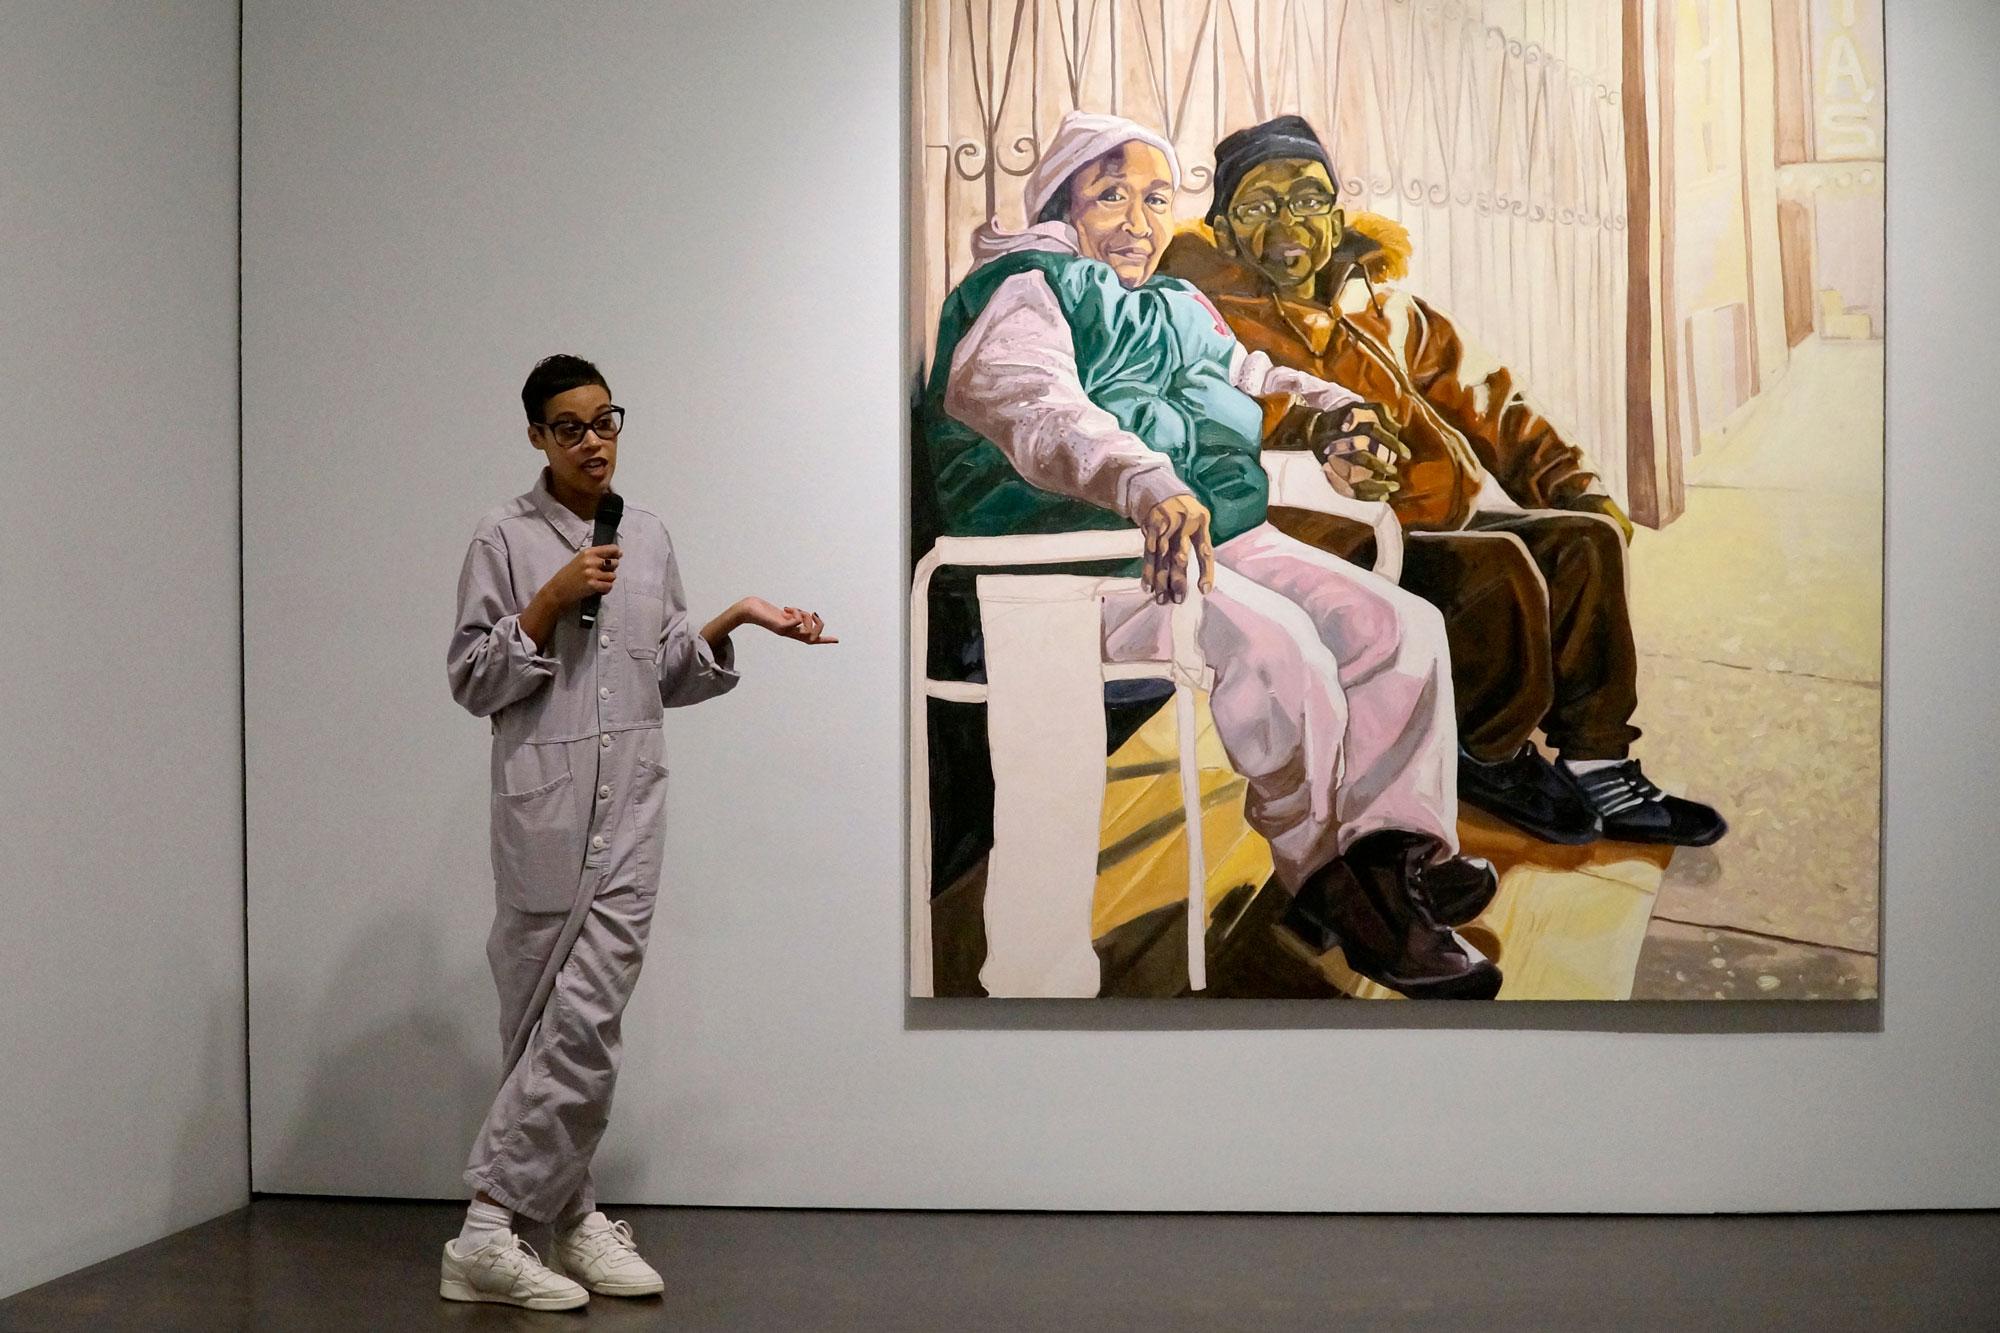 <p>Denver-born portrait artist Jordan Casteel speaks during the Denver Art Museum's media preview of her first solo museum exhibition on Jan. 31, 2019.</p>